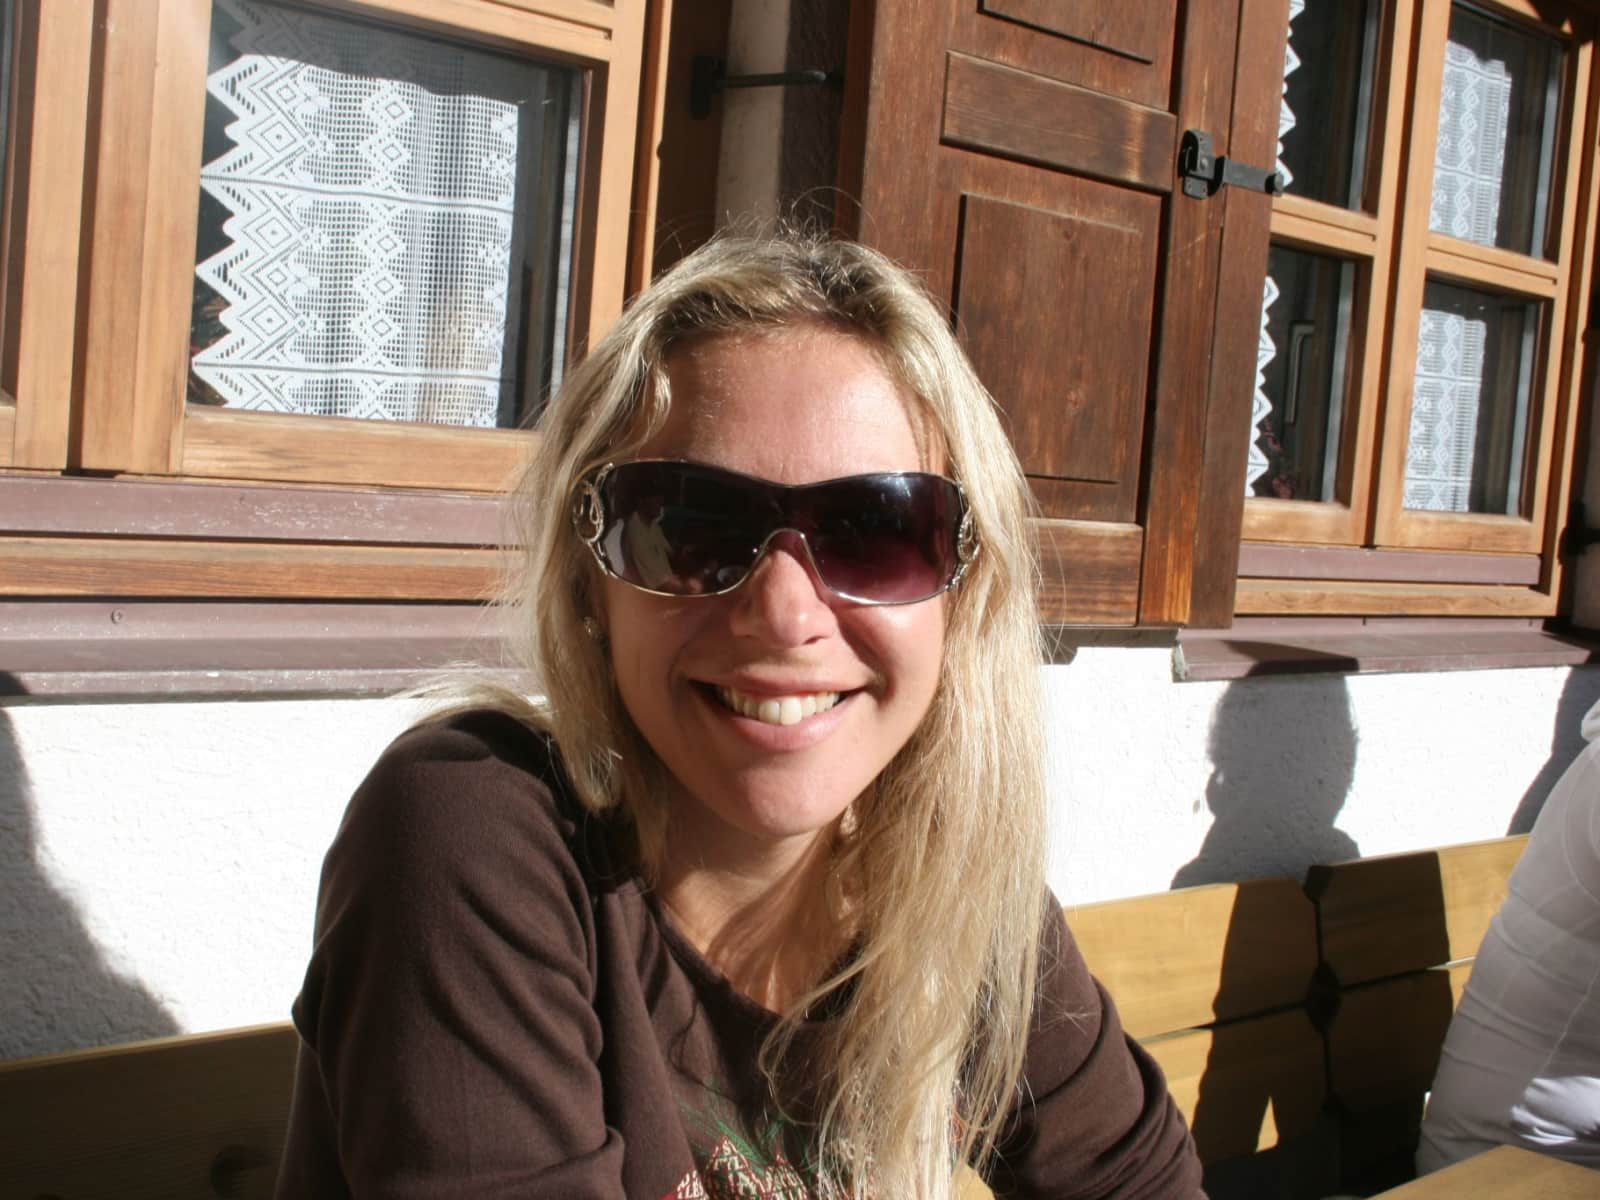 Gabriela from Teplice, Czech Republic